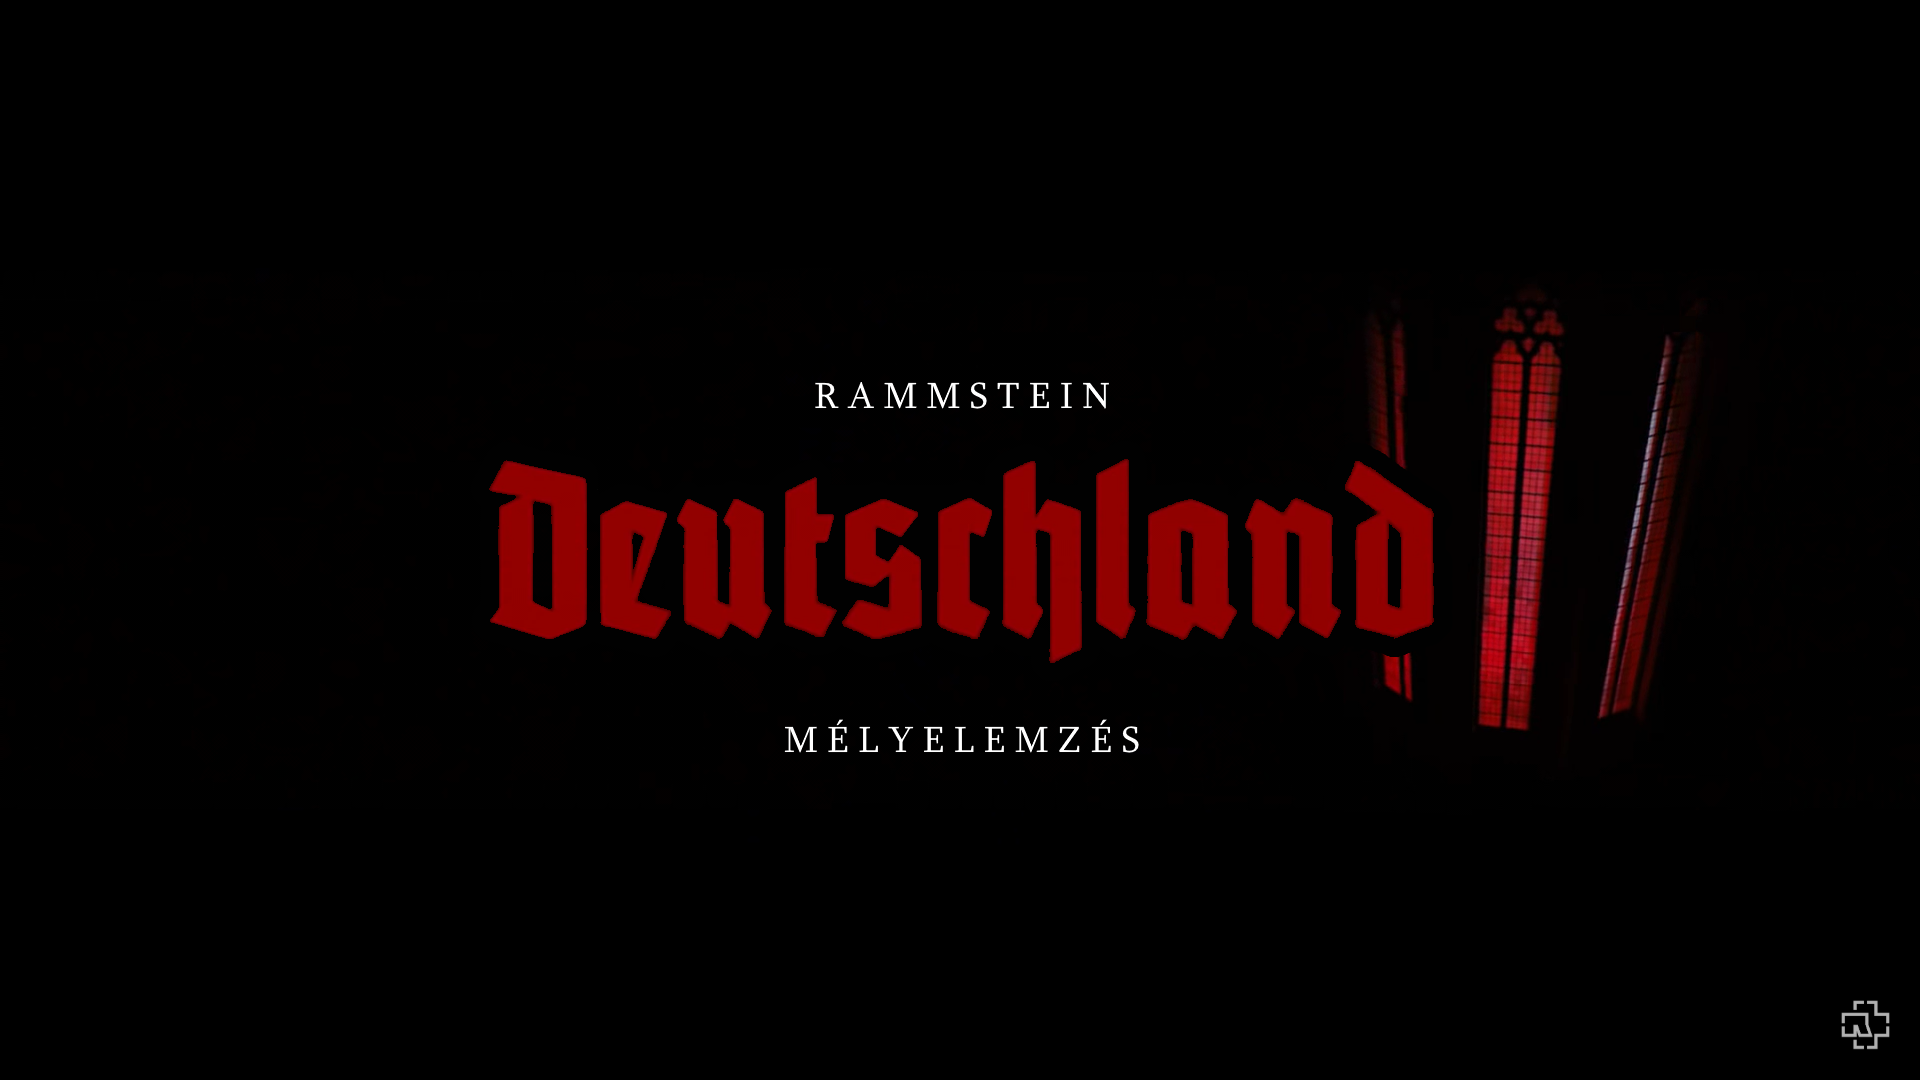 rammstein_deutschland_elemzes_coverkep_felirat.png